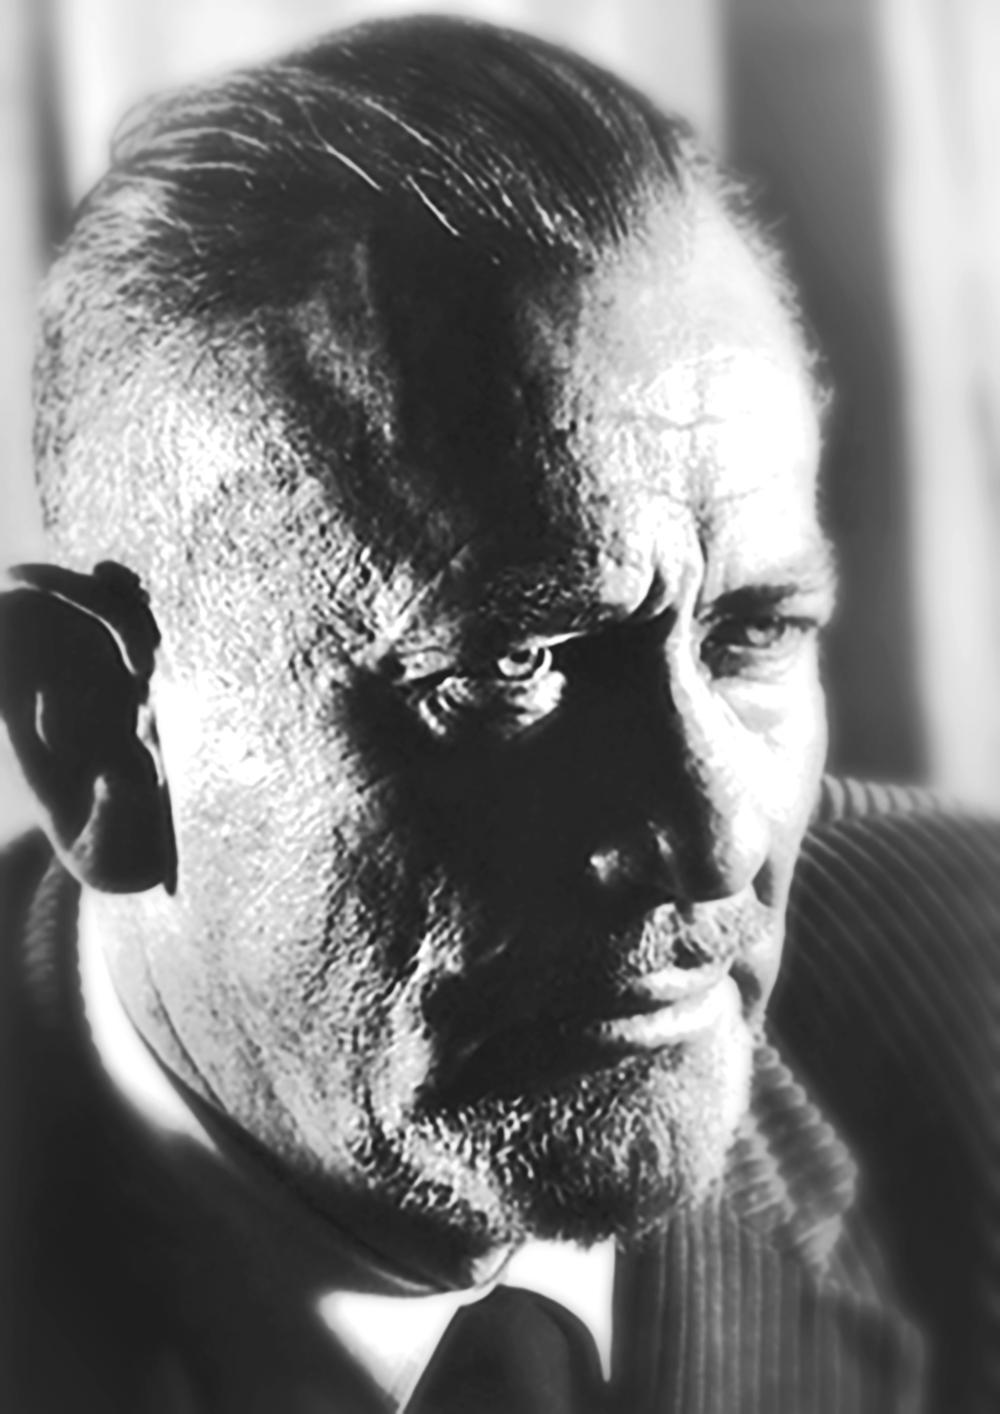 John_Steinbeck_1962 edit.png